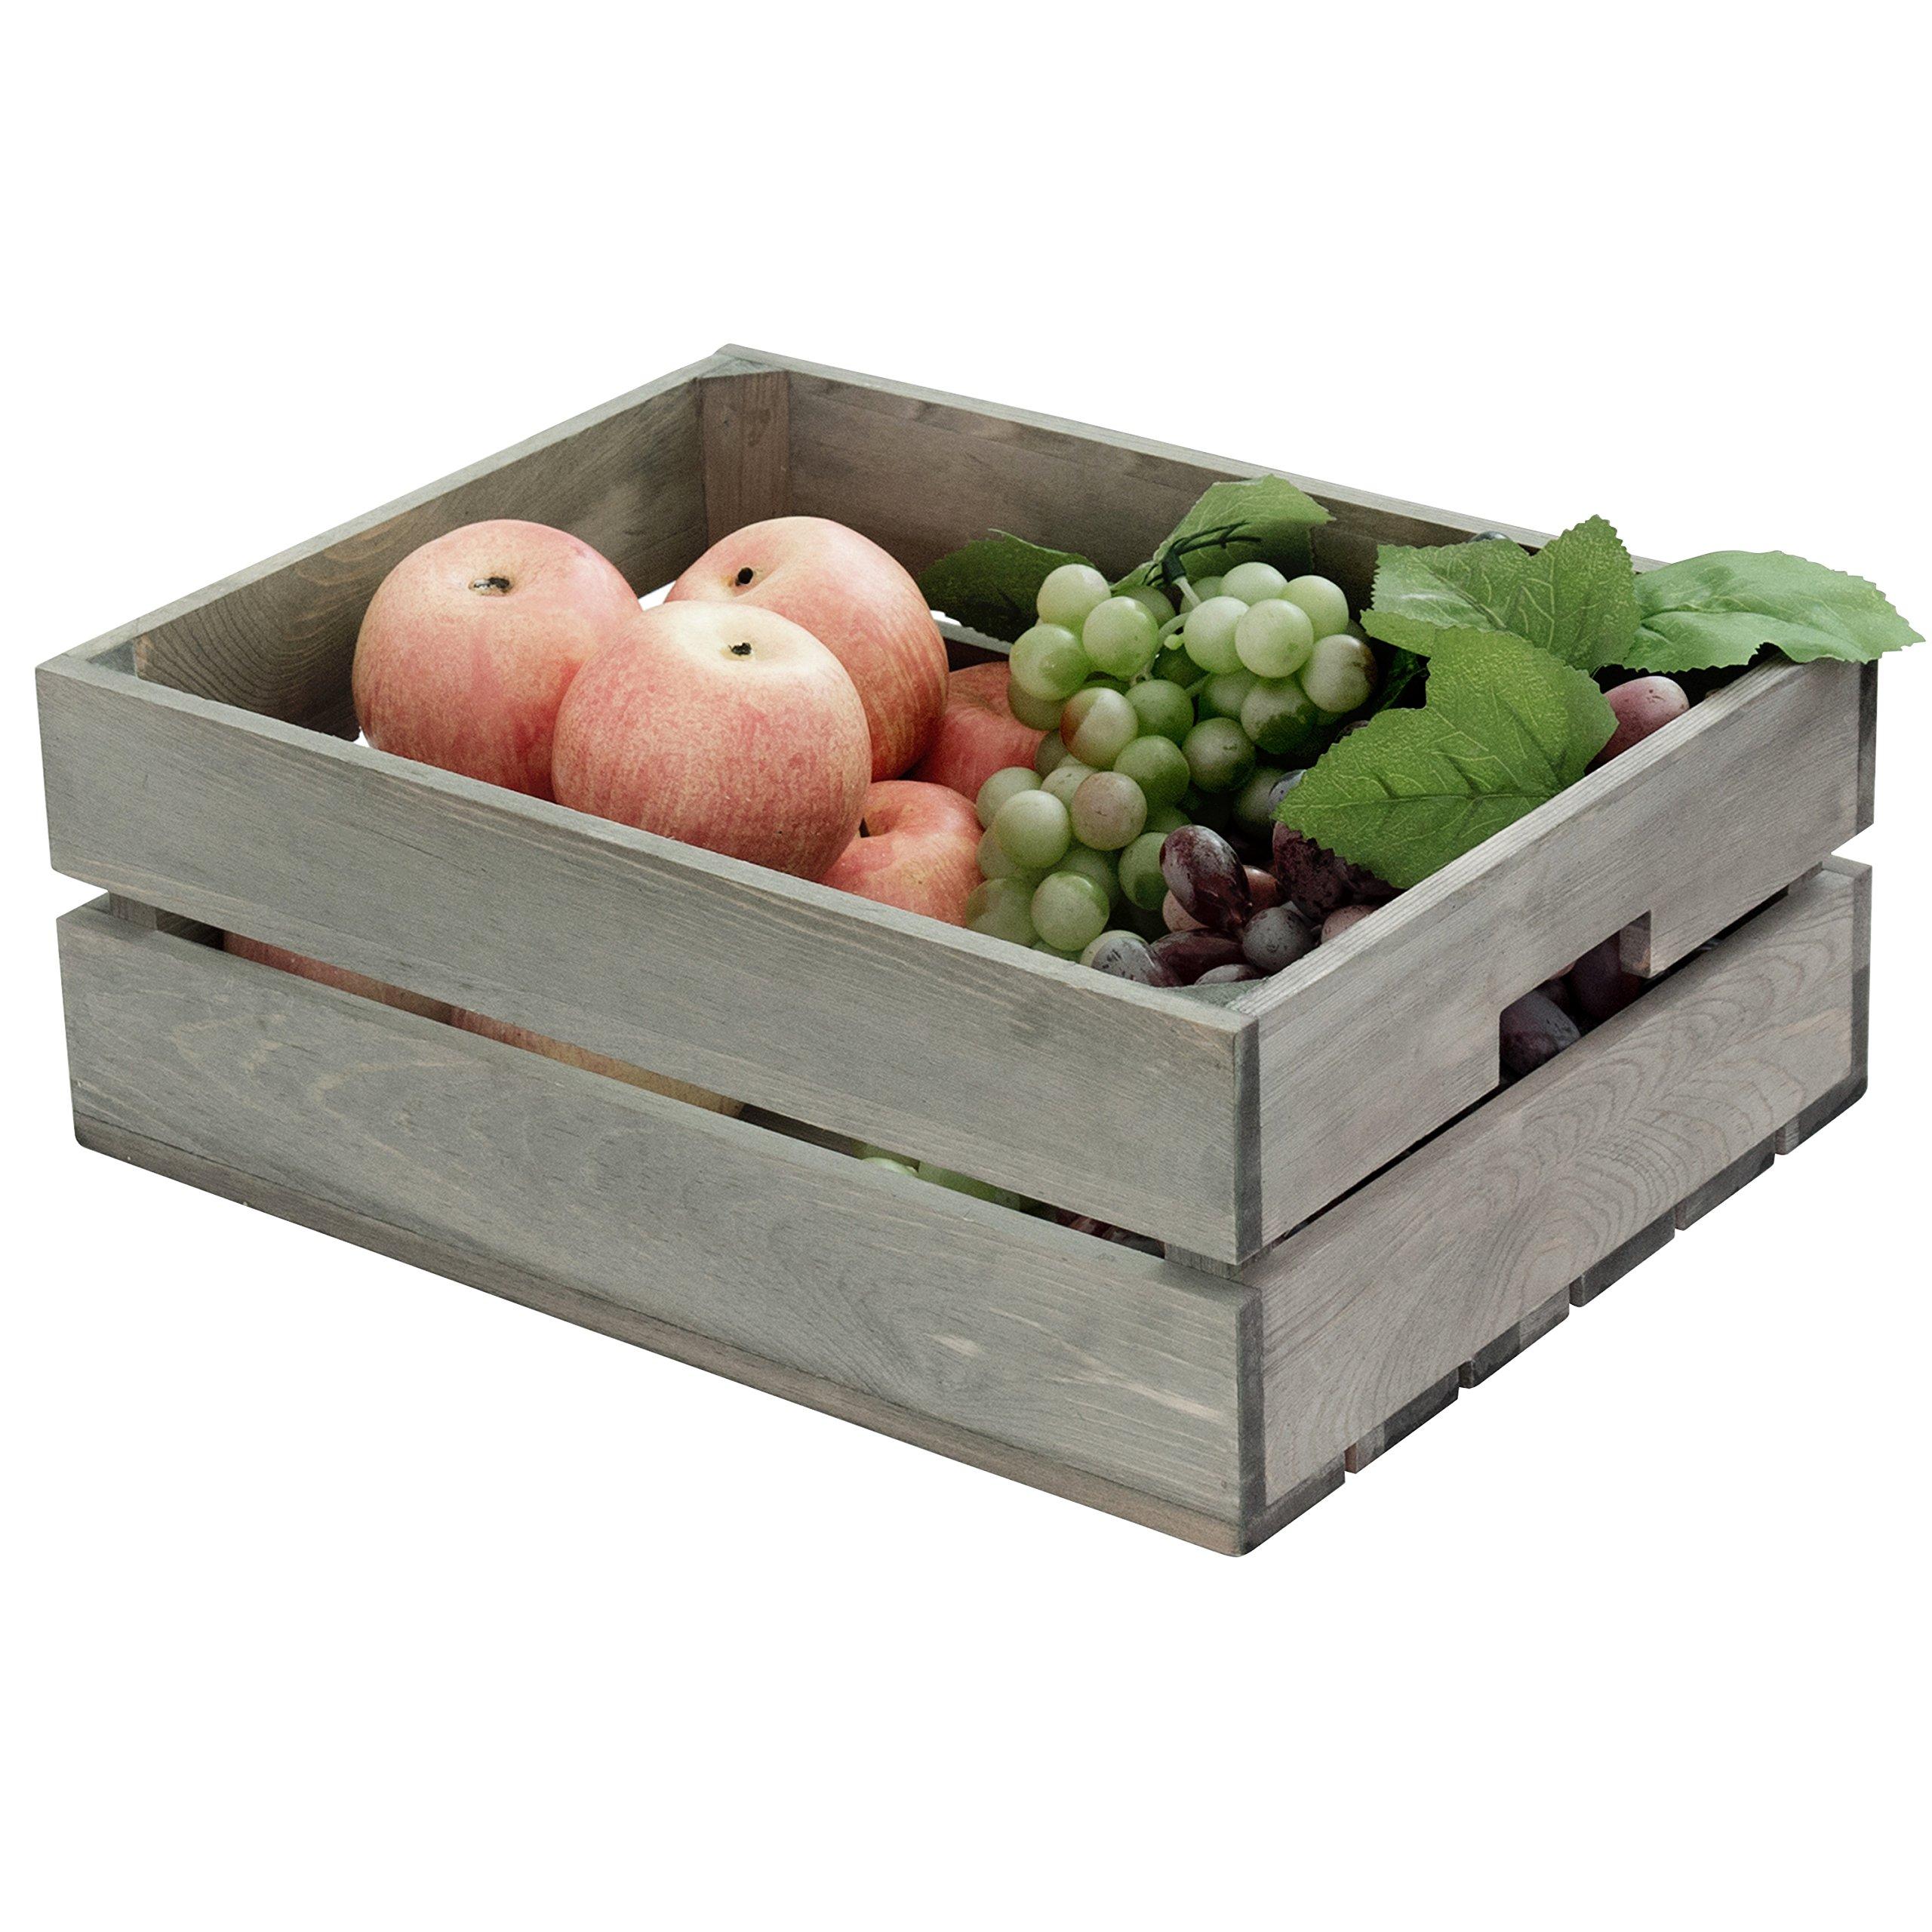 Barnwood Gray Wood Storage Crate, Decorative Double Handle Open Top Organizer Bin